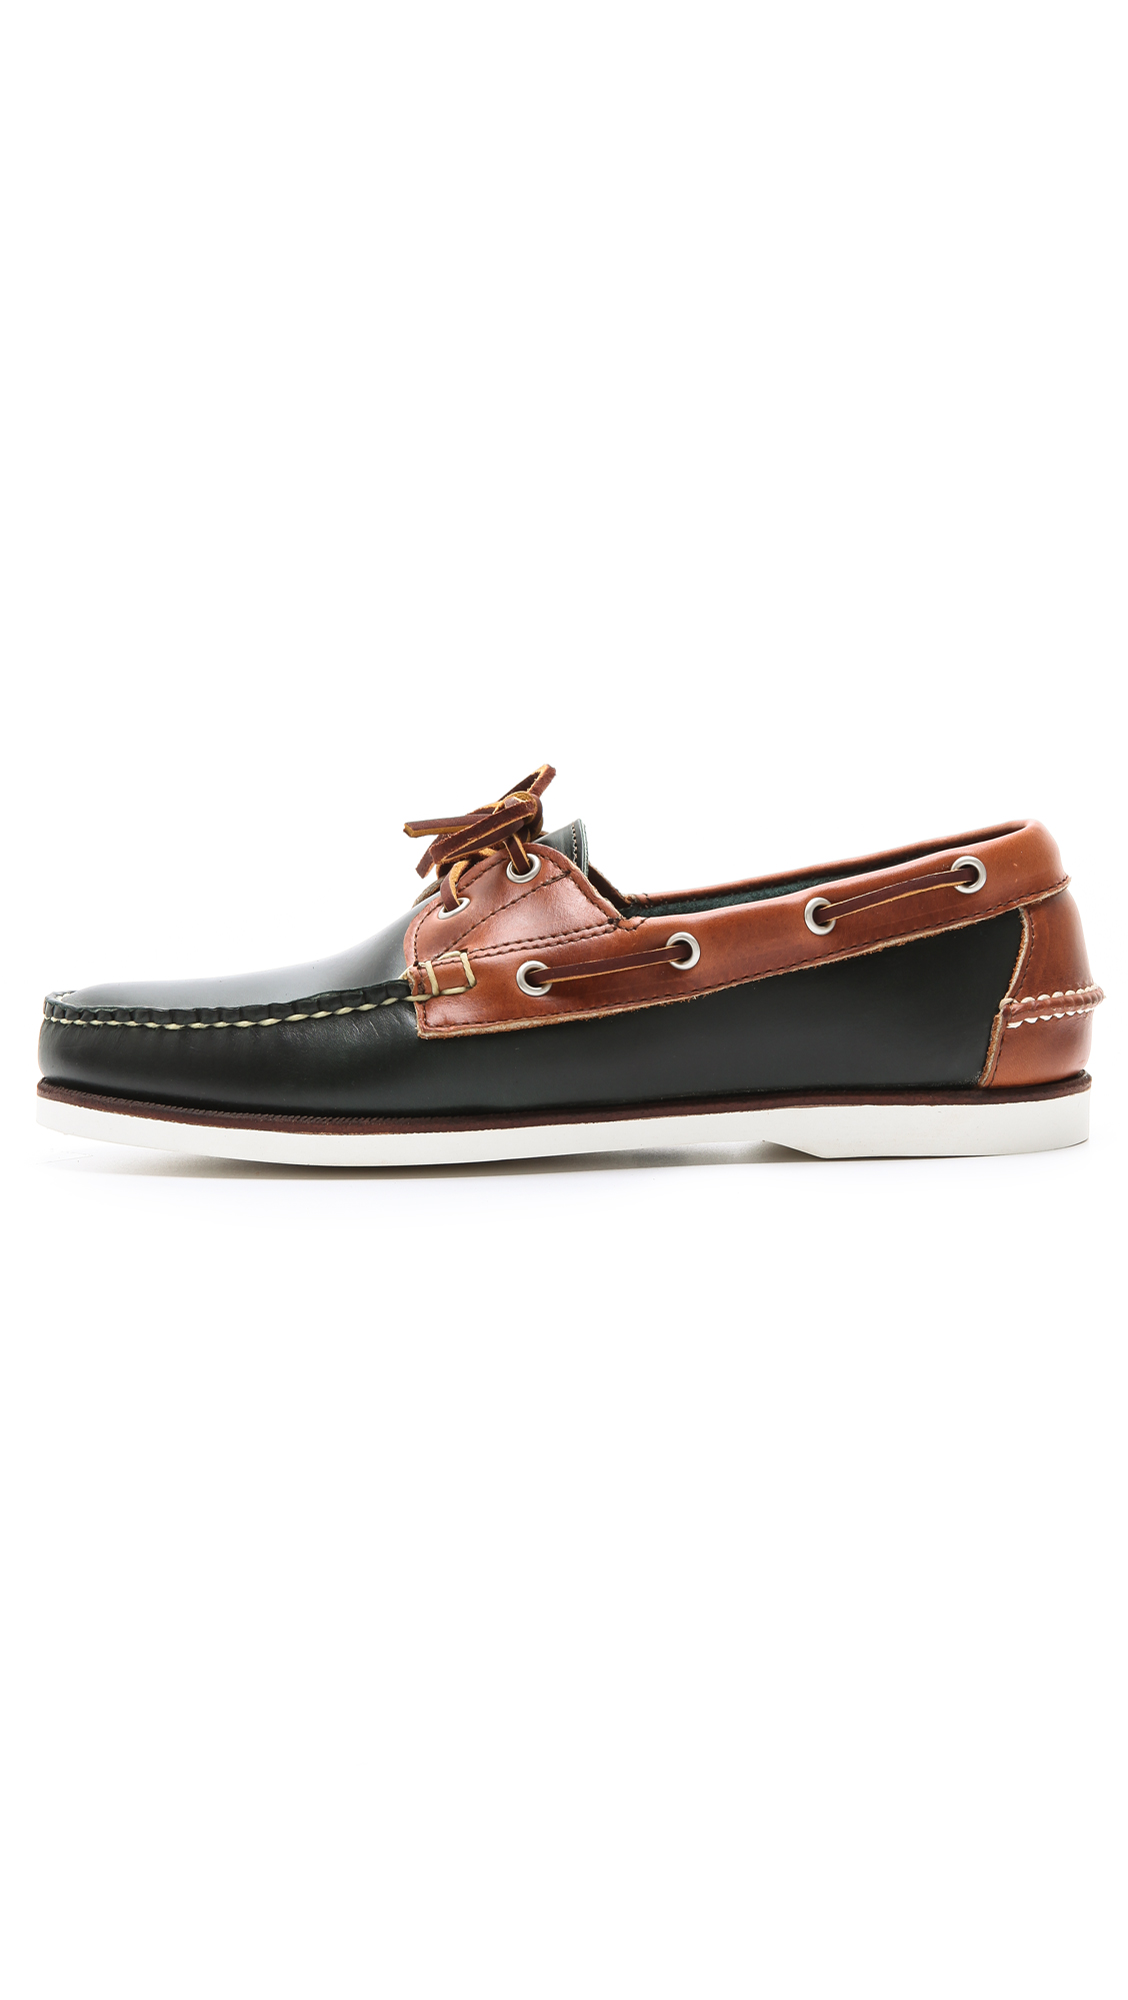 Eastland Freeport 2 Eye Boat Shoes in Brown for Men